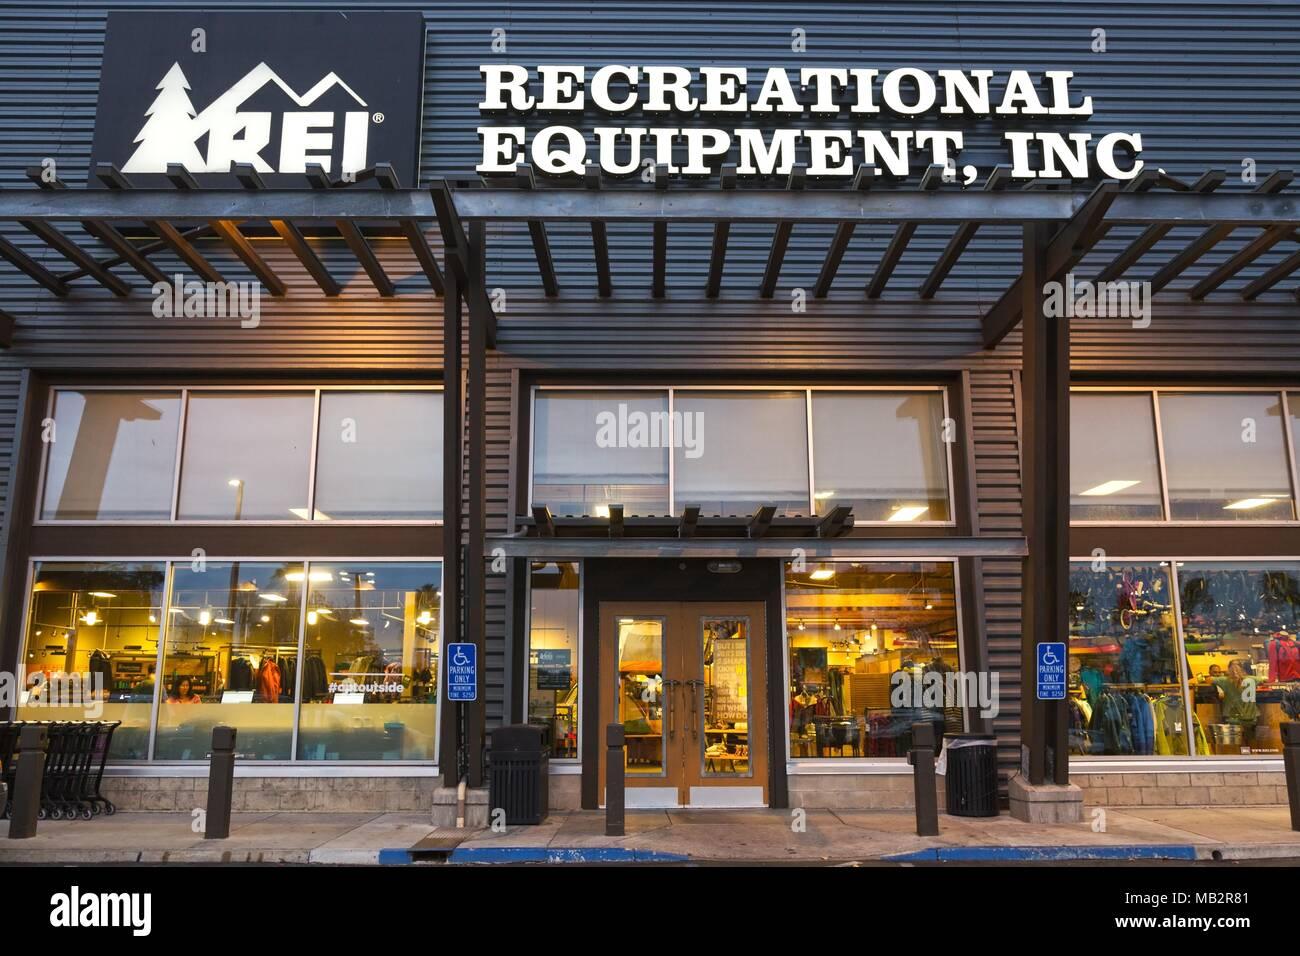 recreational-equipment-inc-rei-building-